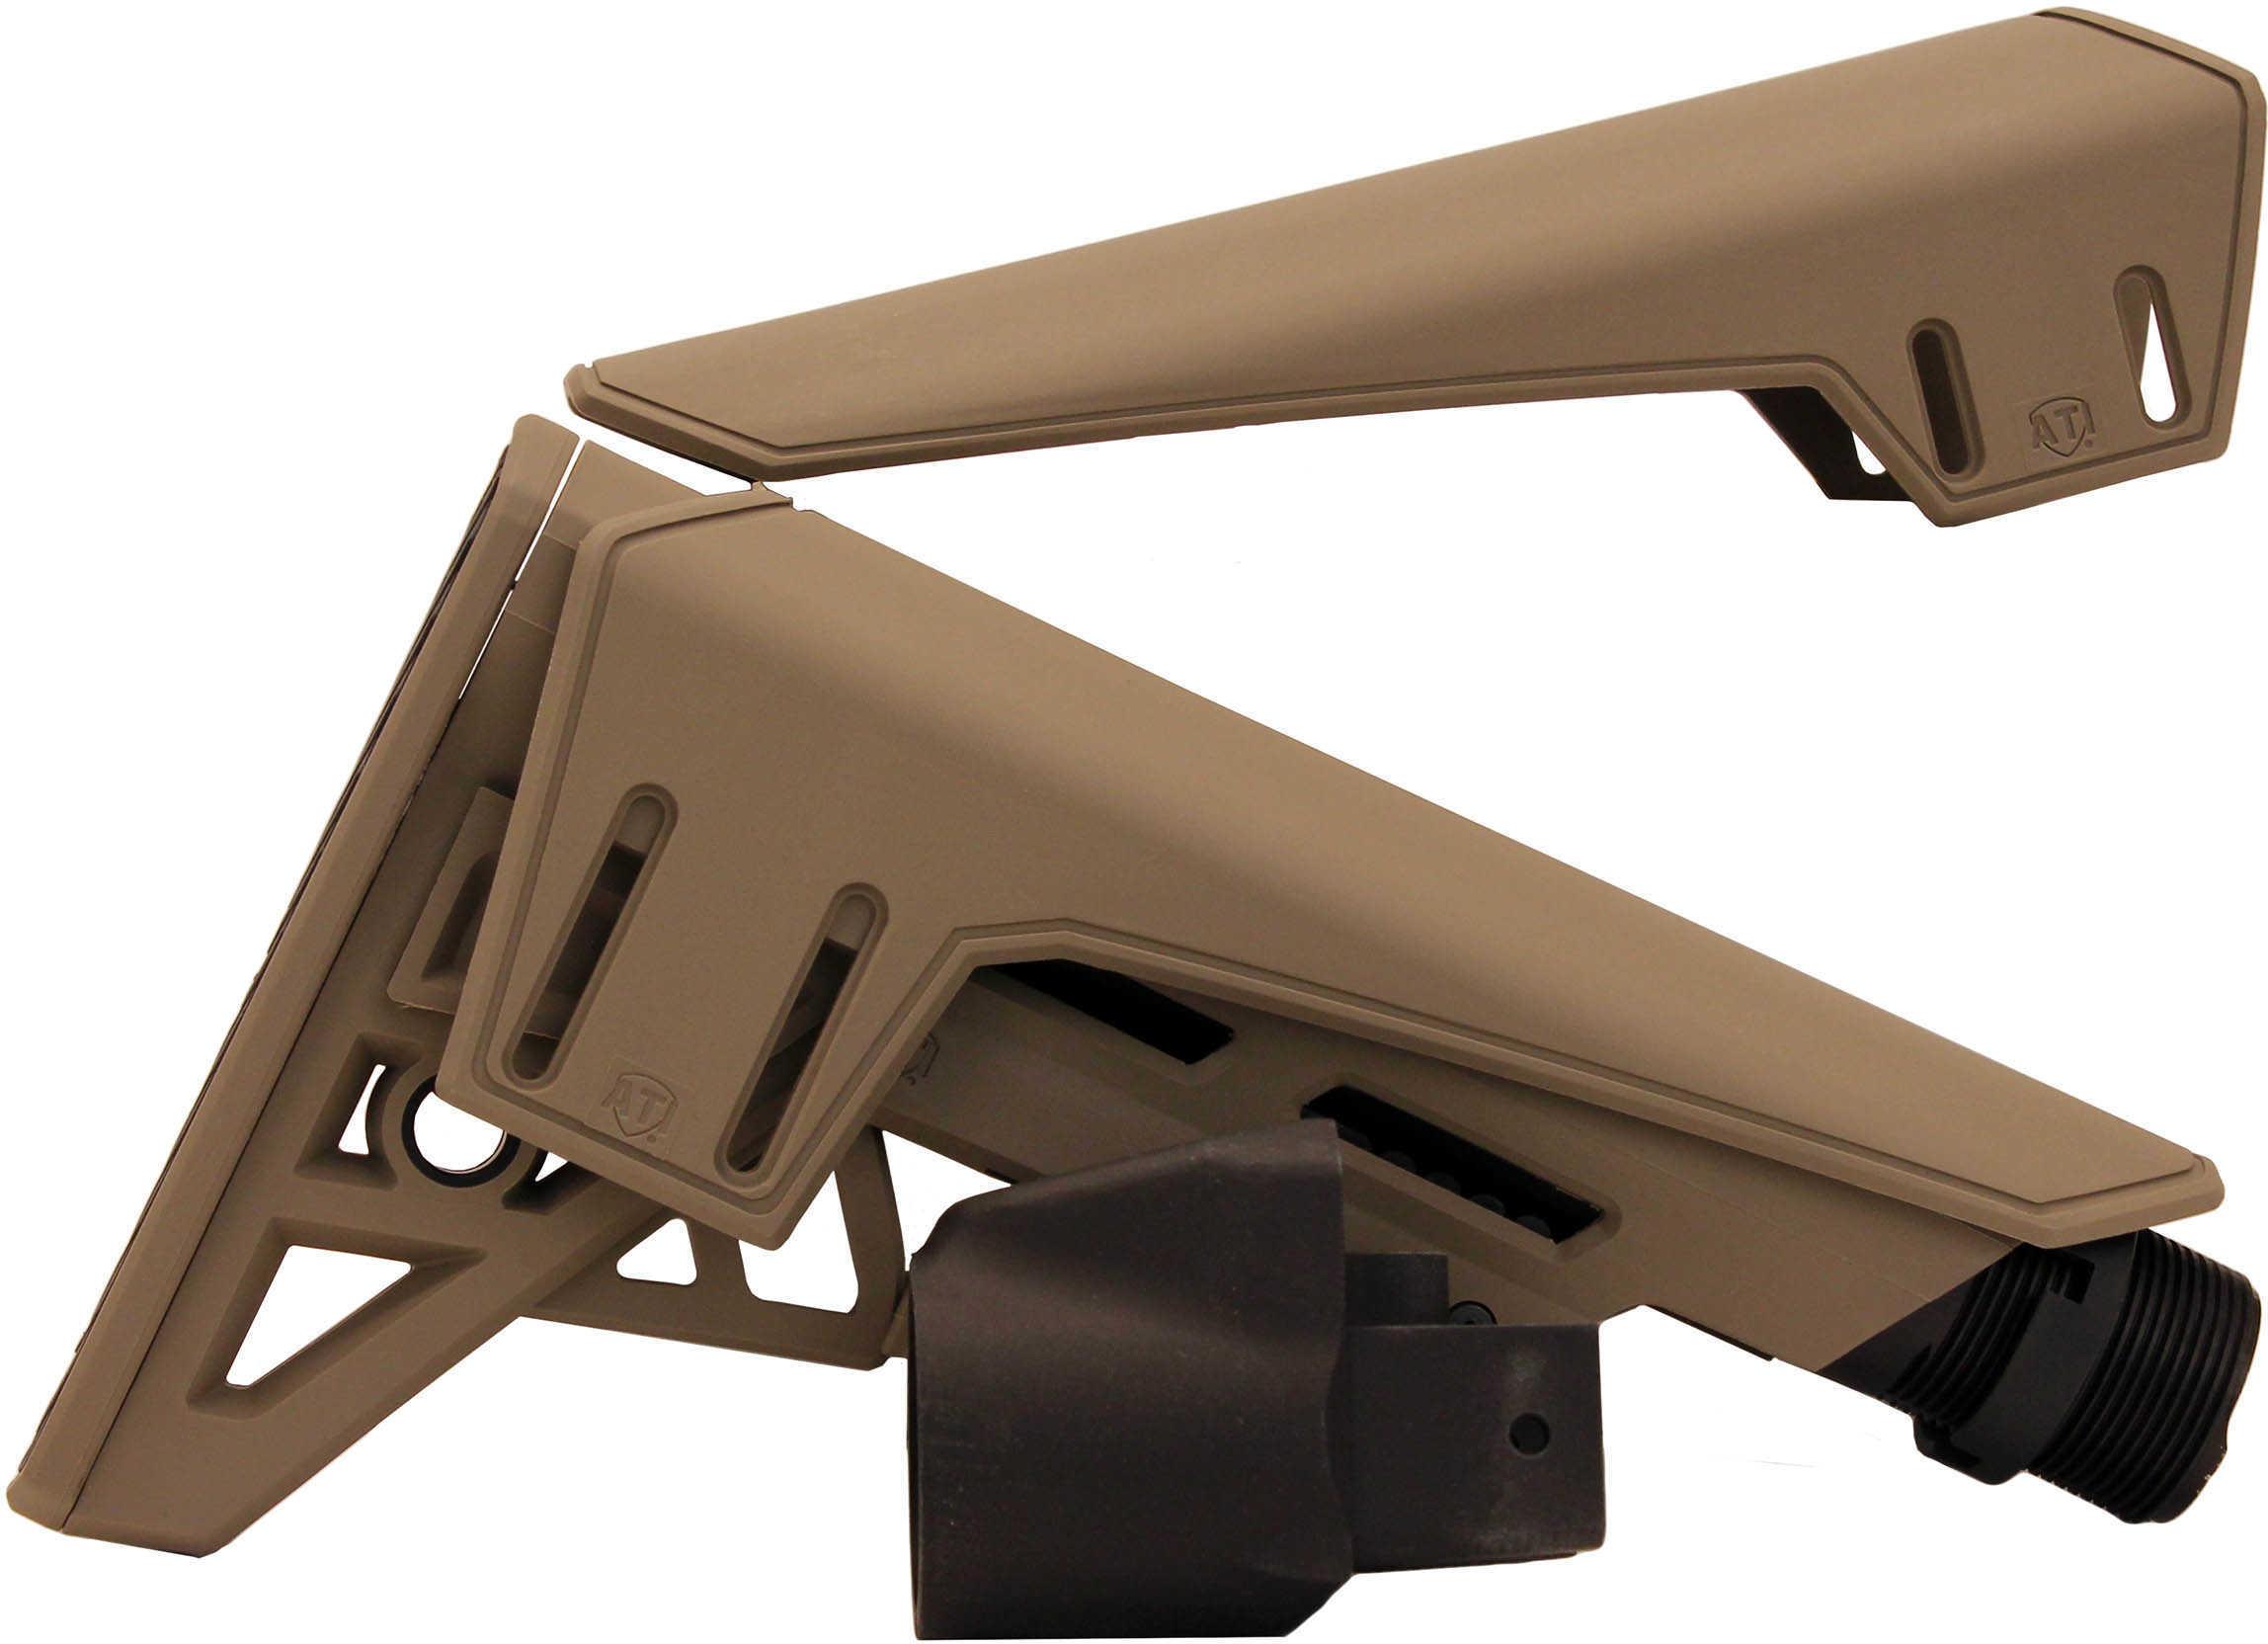 Advanced Technology Intl. AK-47 TactLite Elite Adjustable Stock w/SRP Flat Dark Earth Md: B.2.20.1265